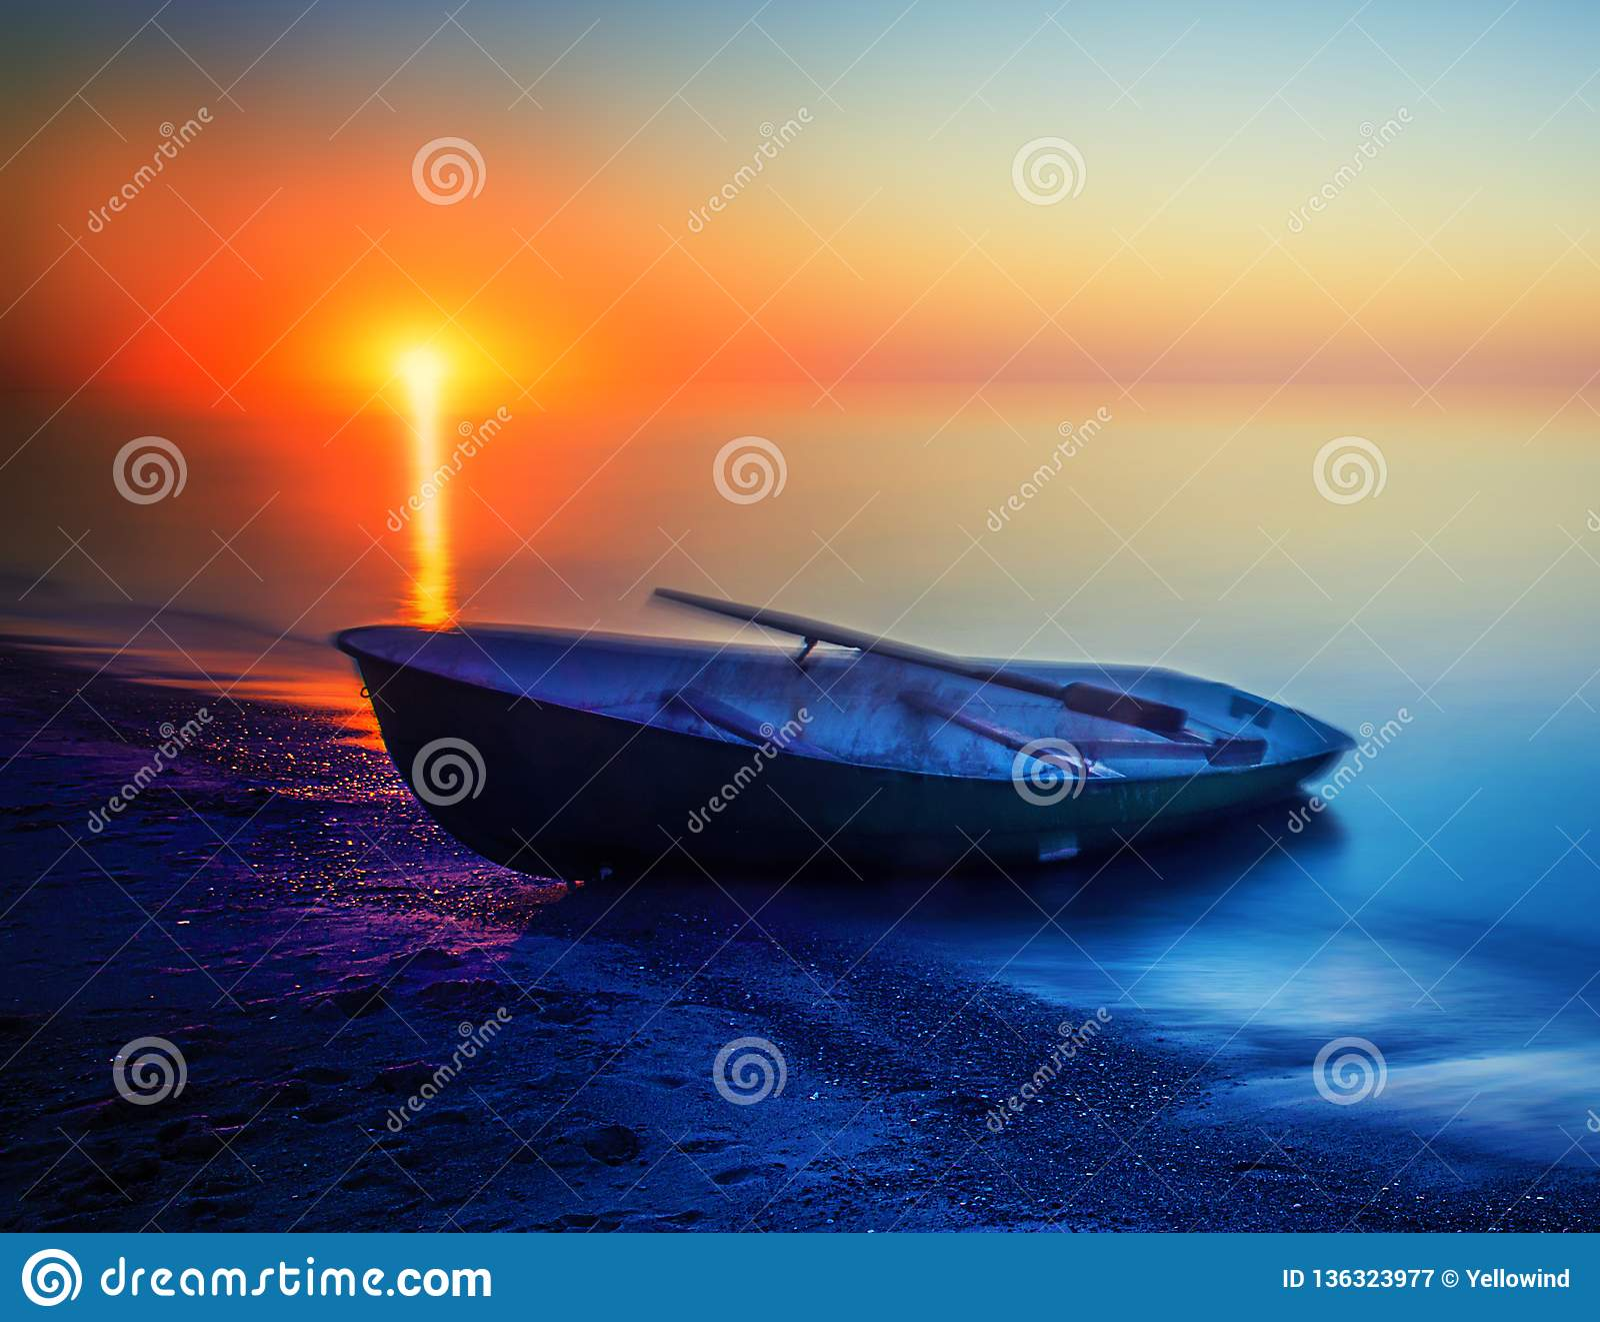 Seascape summer sunset